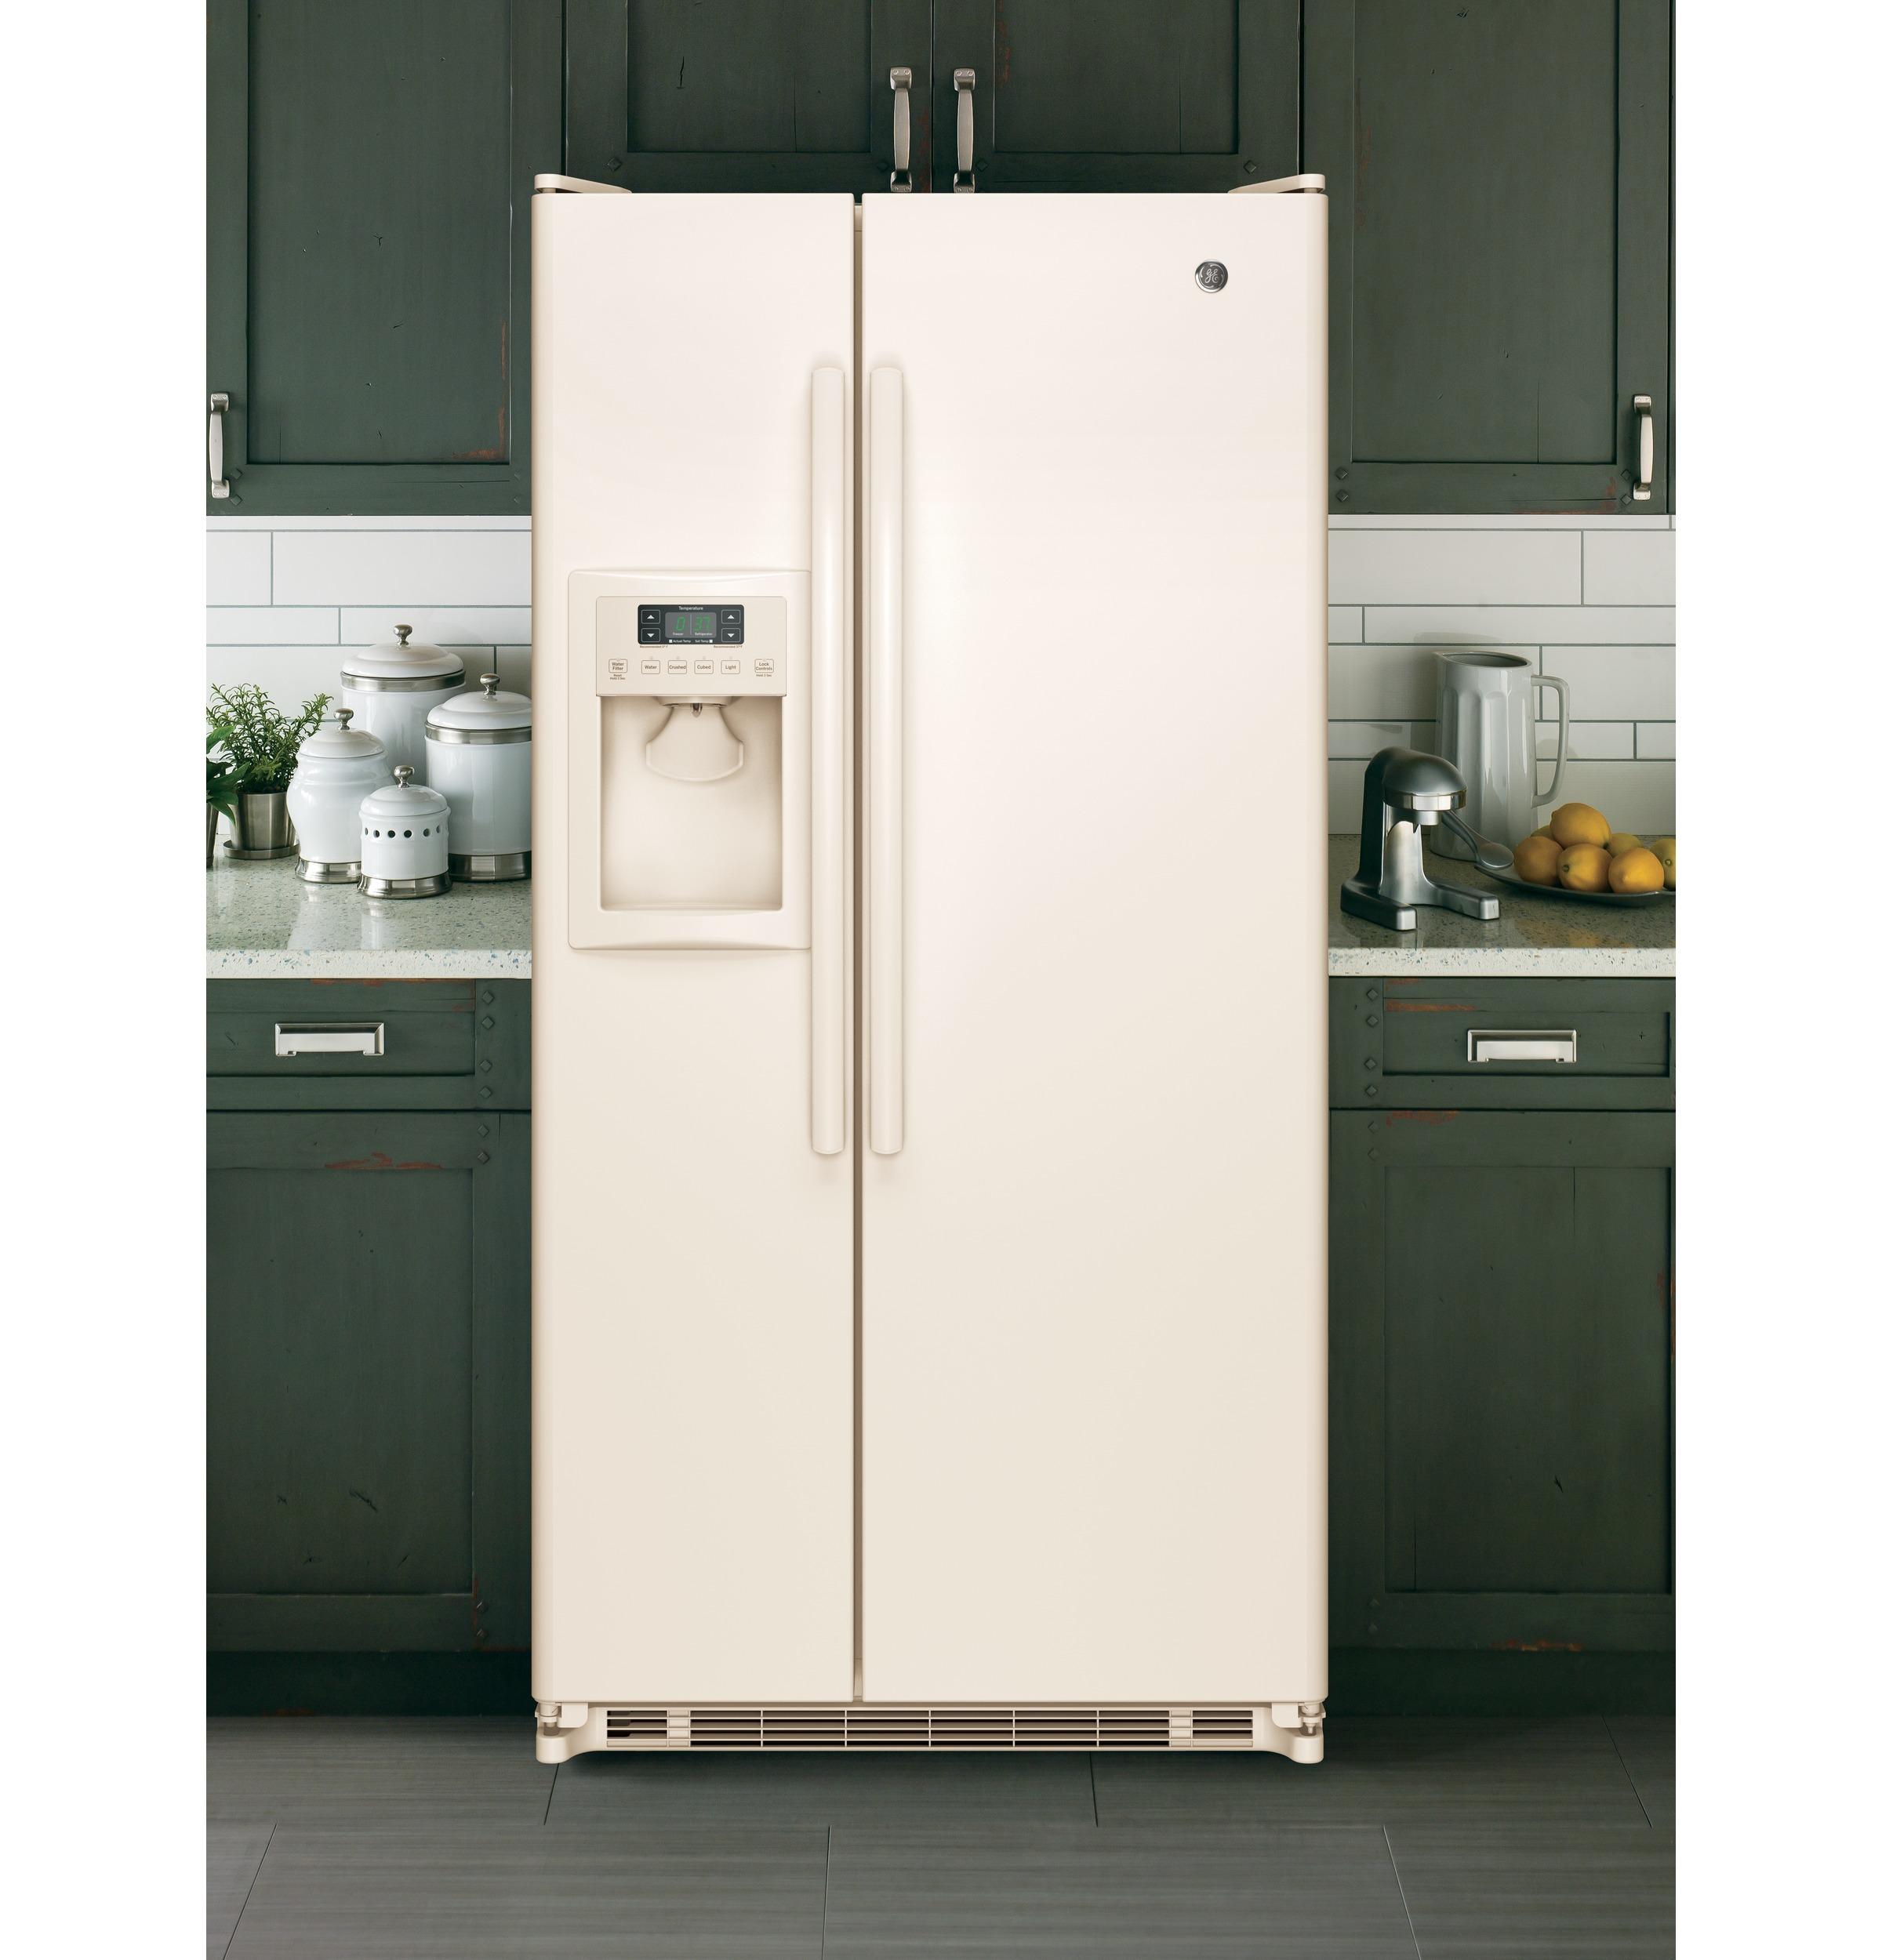 GE Appliances GSE22ETHCC 21.8 cu. ft. Side-by-Side Refrigerator - Bisque